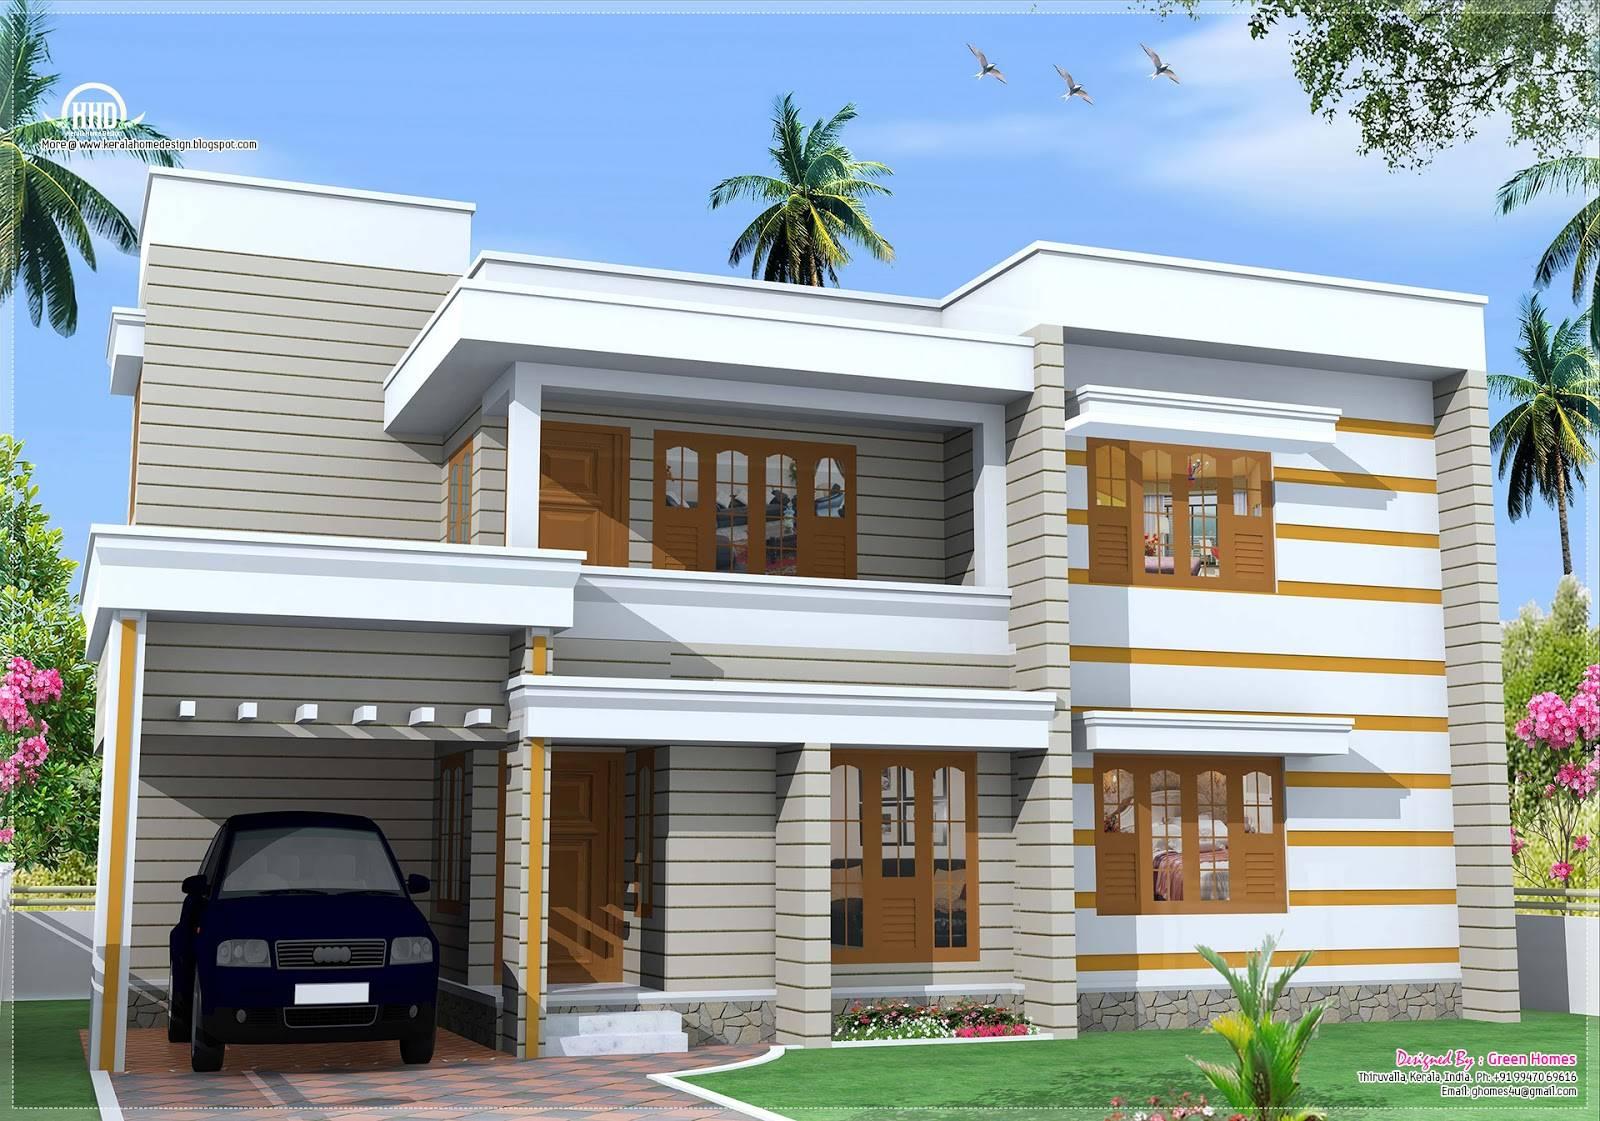 Flat Roof House Exterior Feet Design Plans House Plans 65859